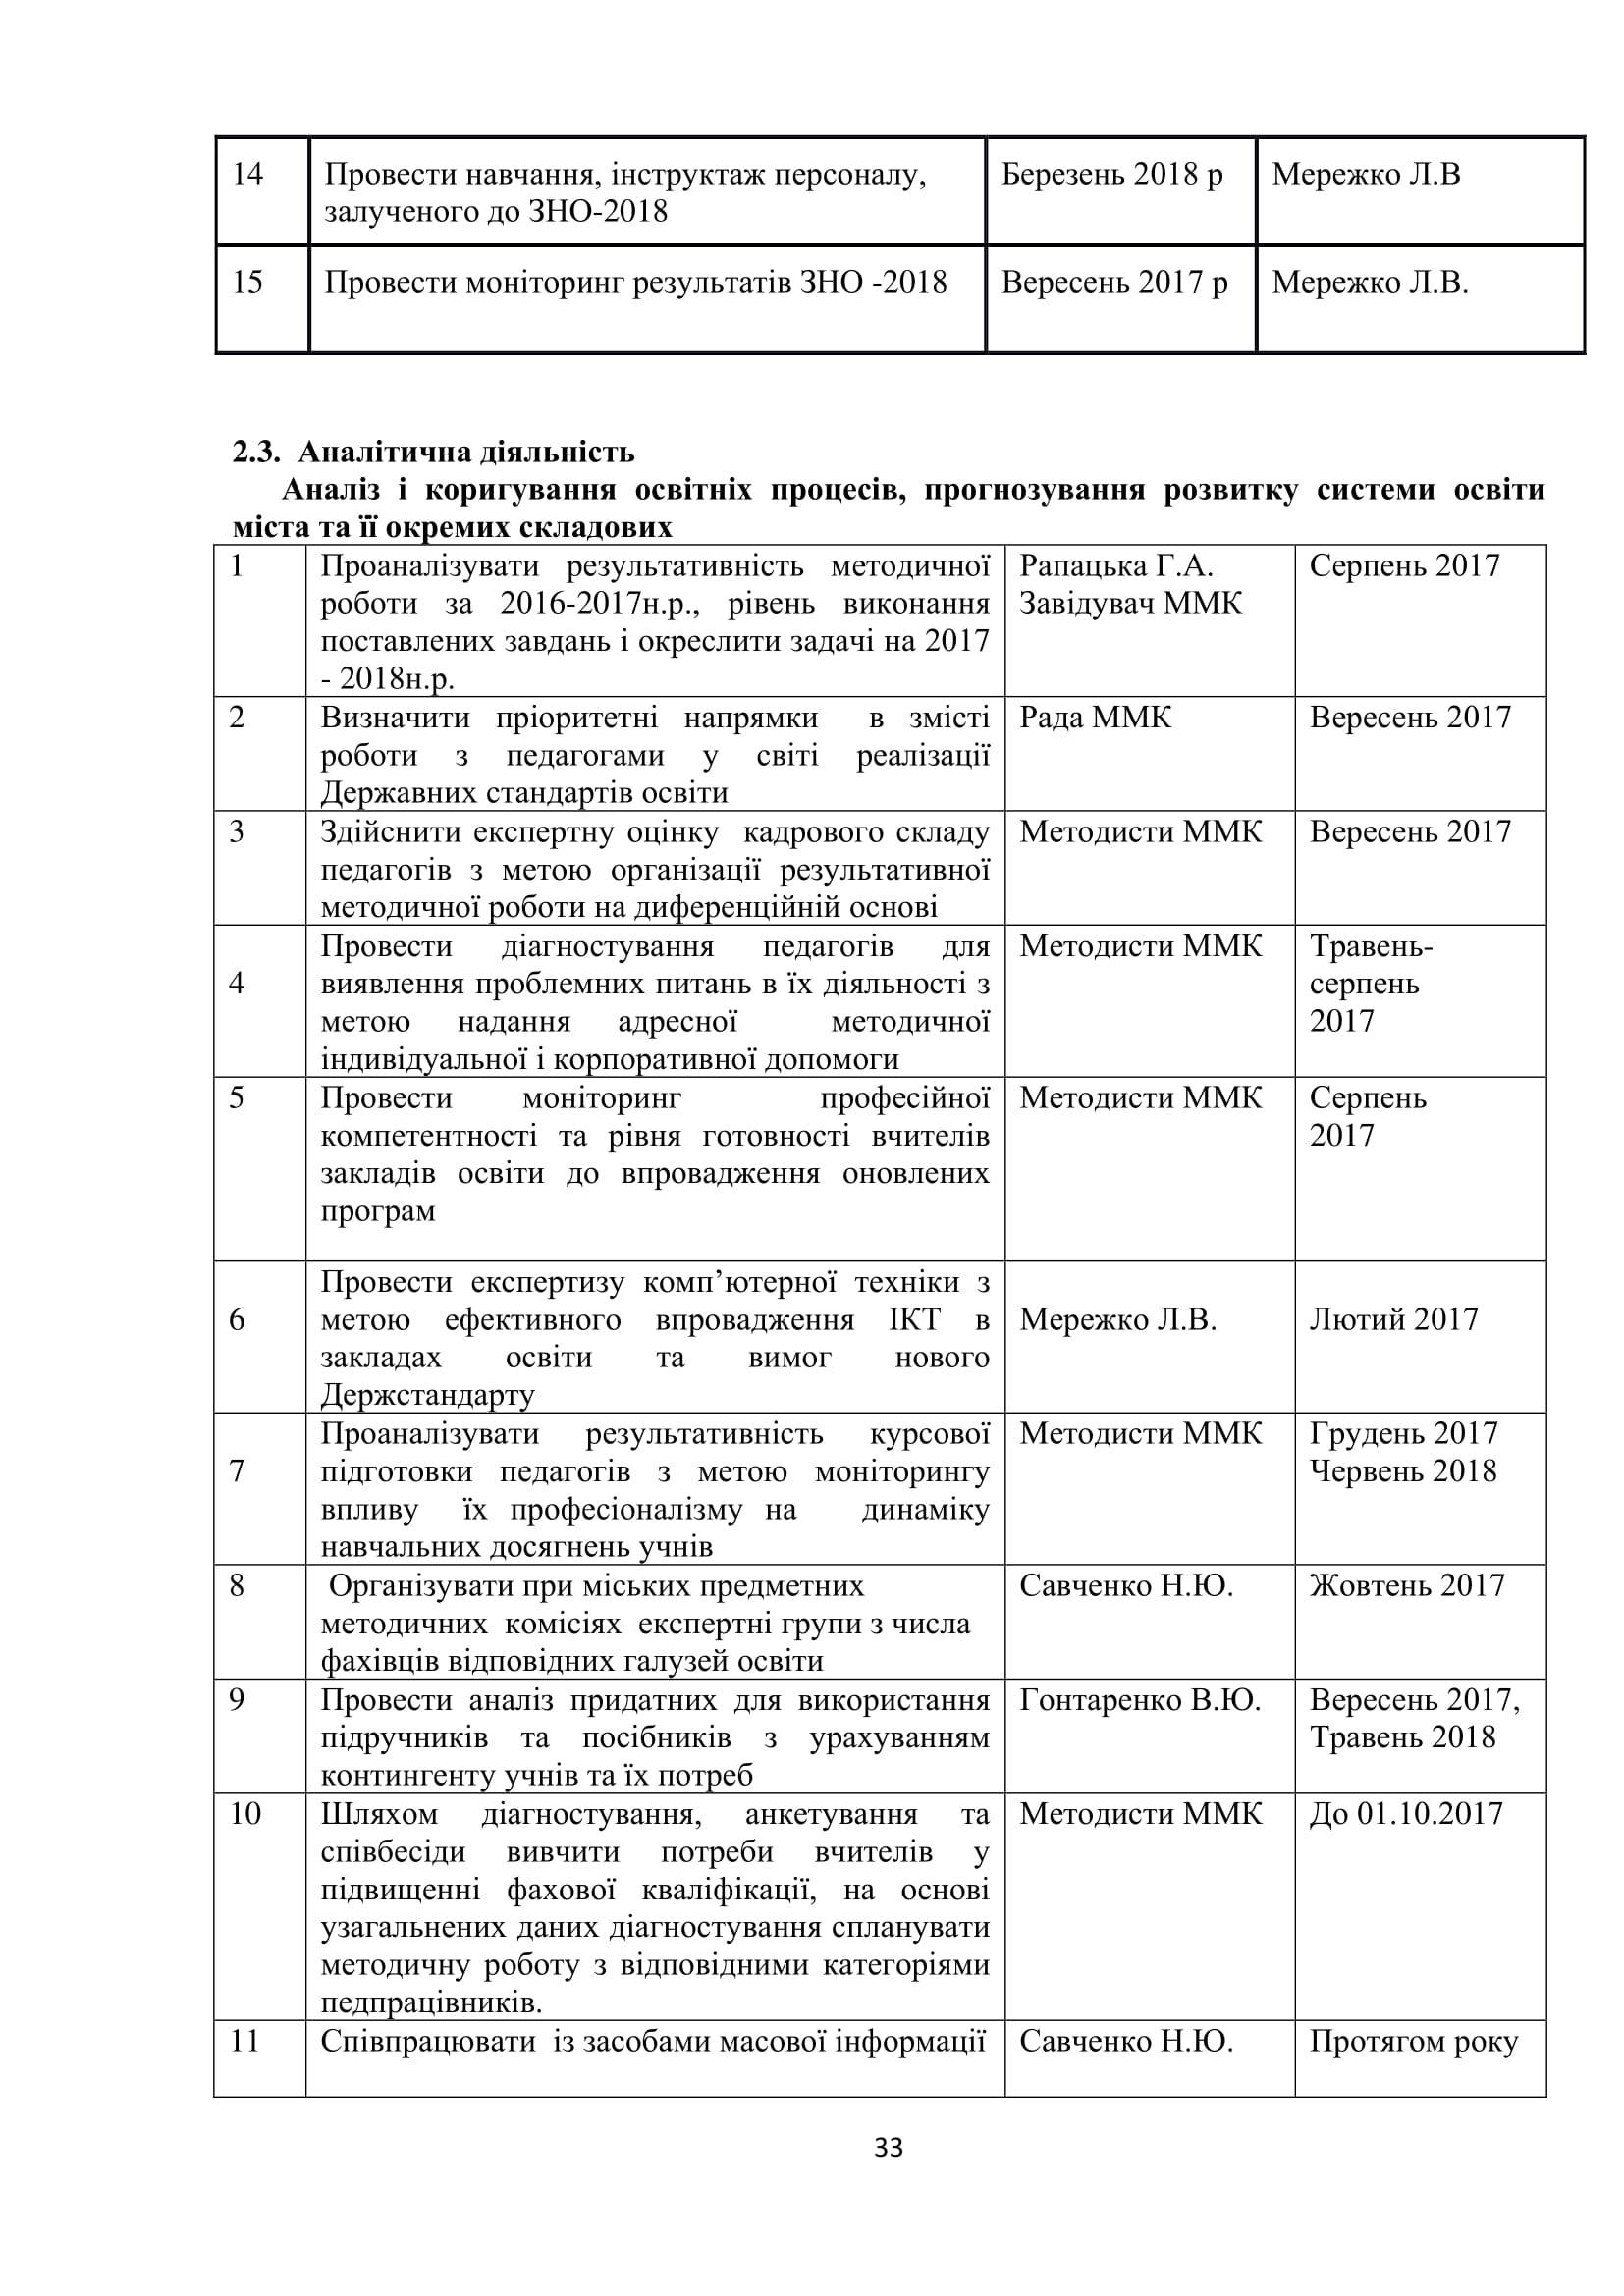 2017-2018 - ММК план роботи-34